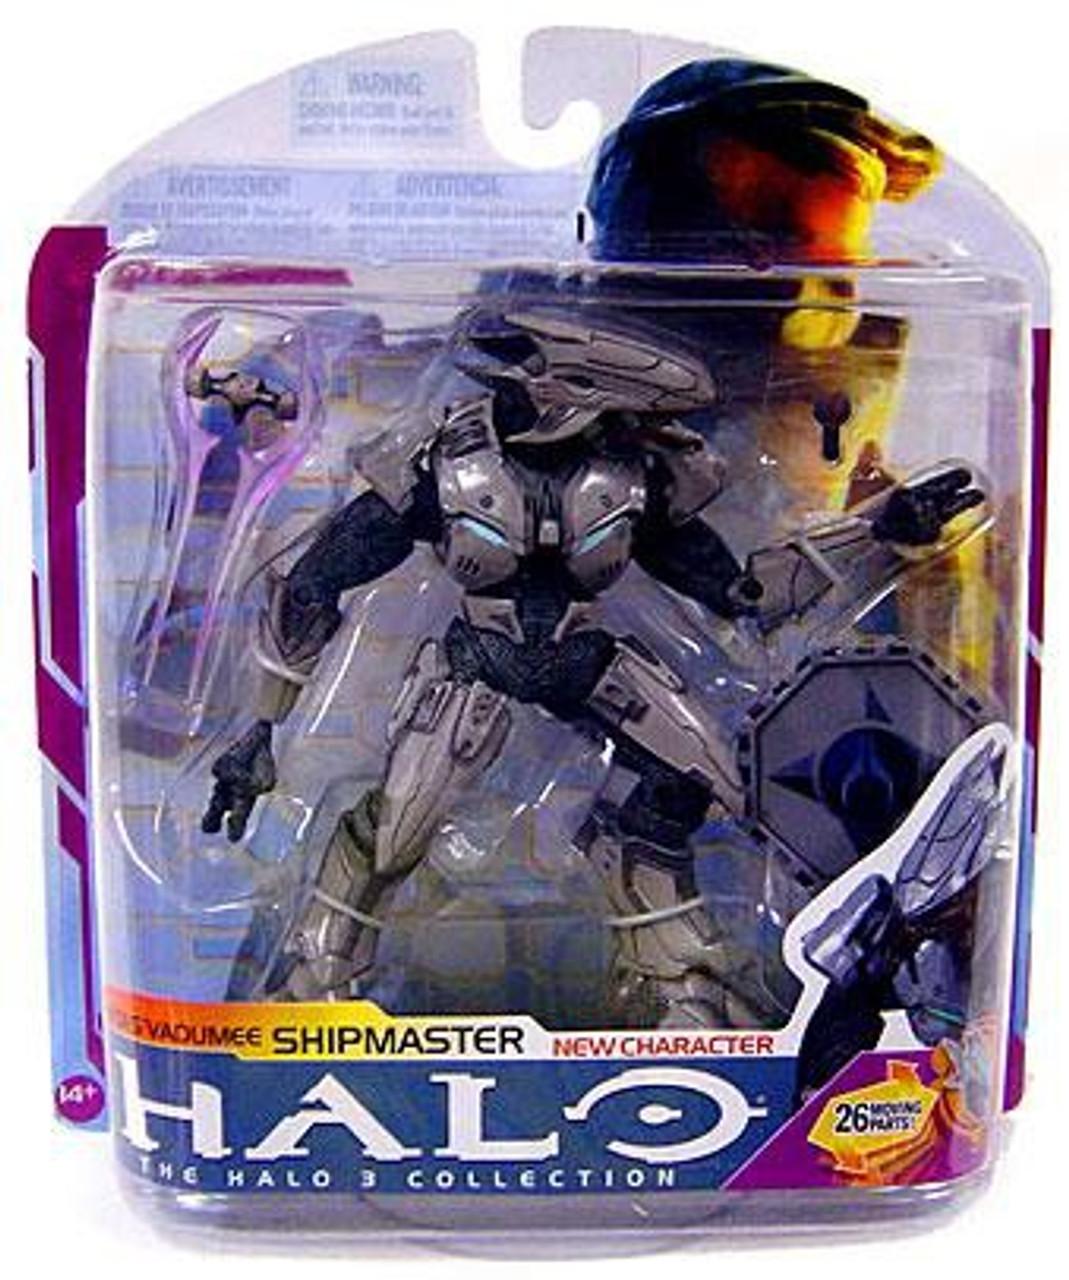 McFarlane Toys Halo 3 Series 6 Medal Edition Shipmaster Rtas Vadumee Action Figure